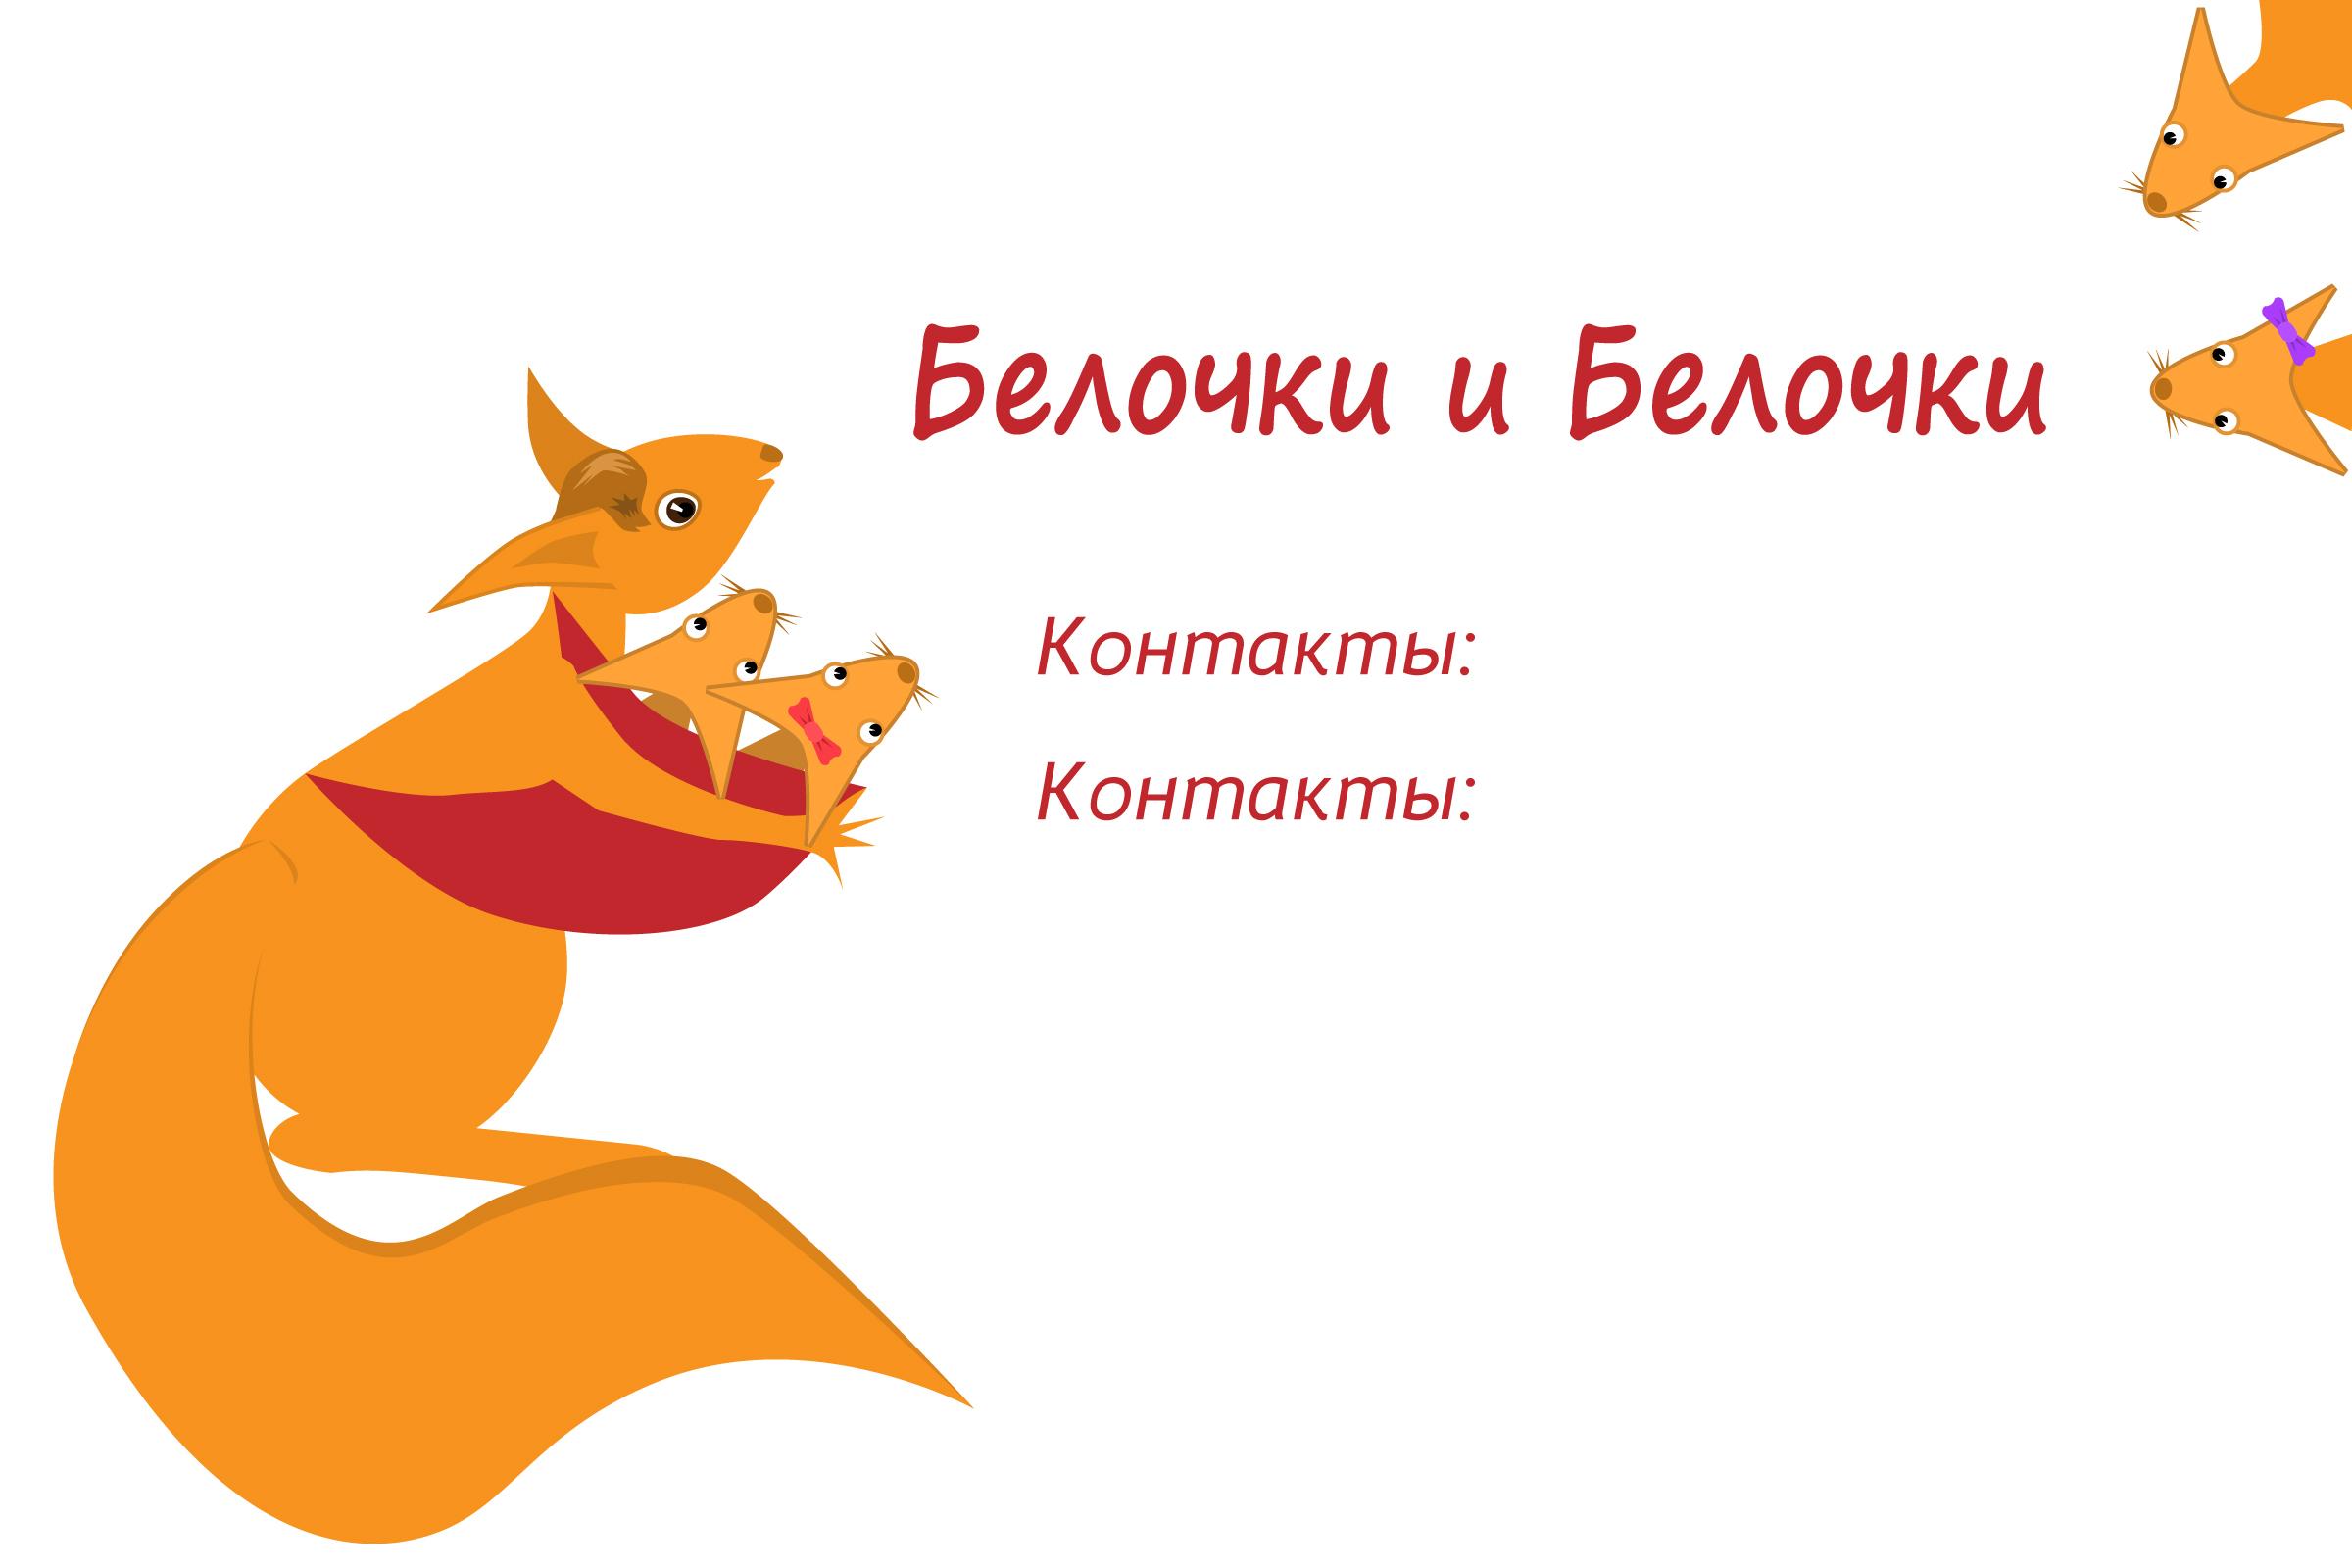 Конкурс на создание макета визиток сообщества мам (белочки). фото f_71959ba616821c4c.jpg